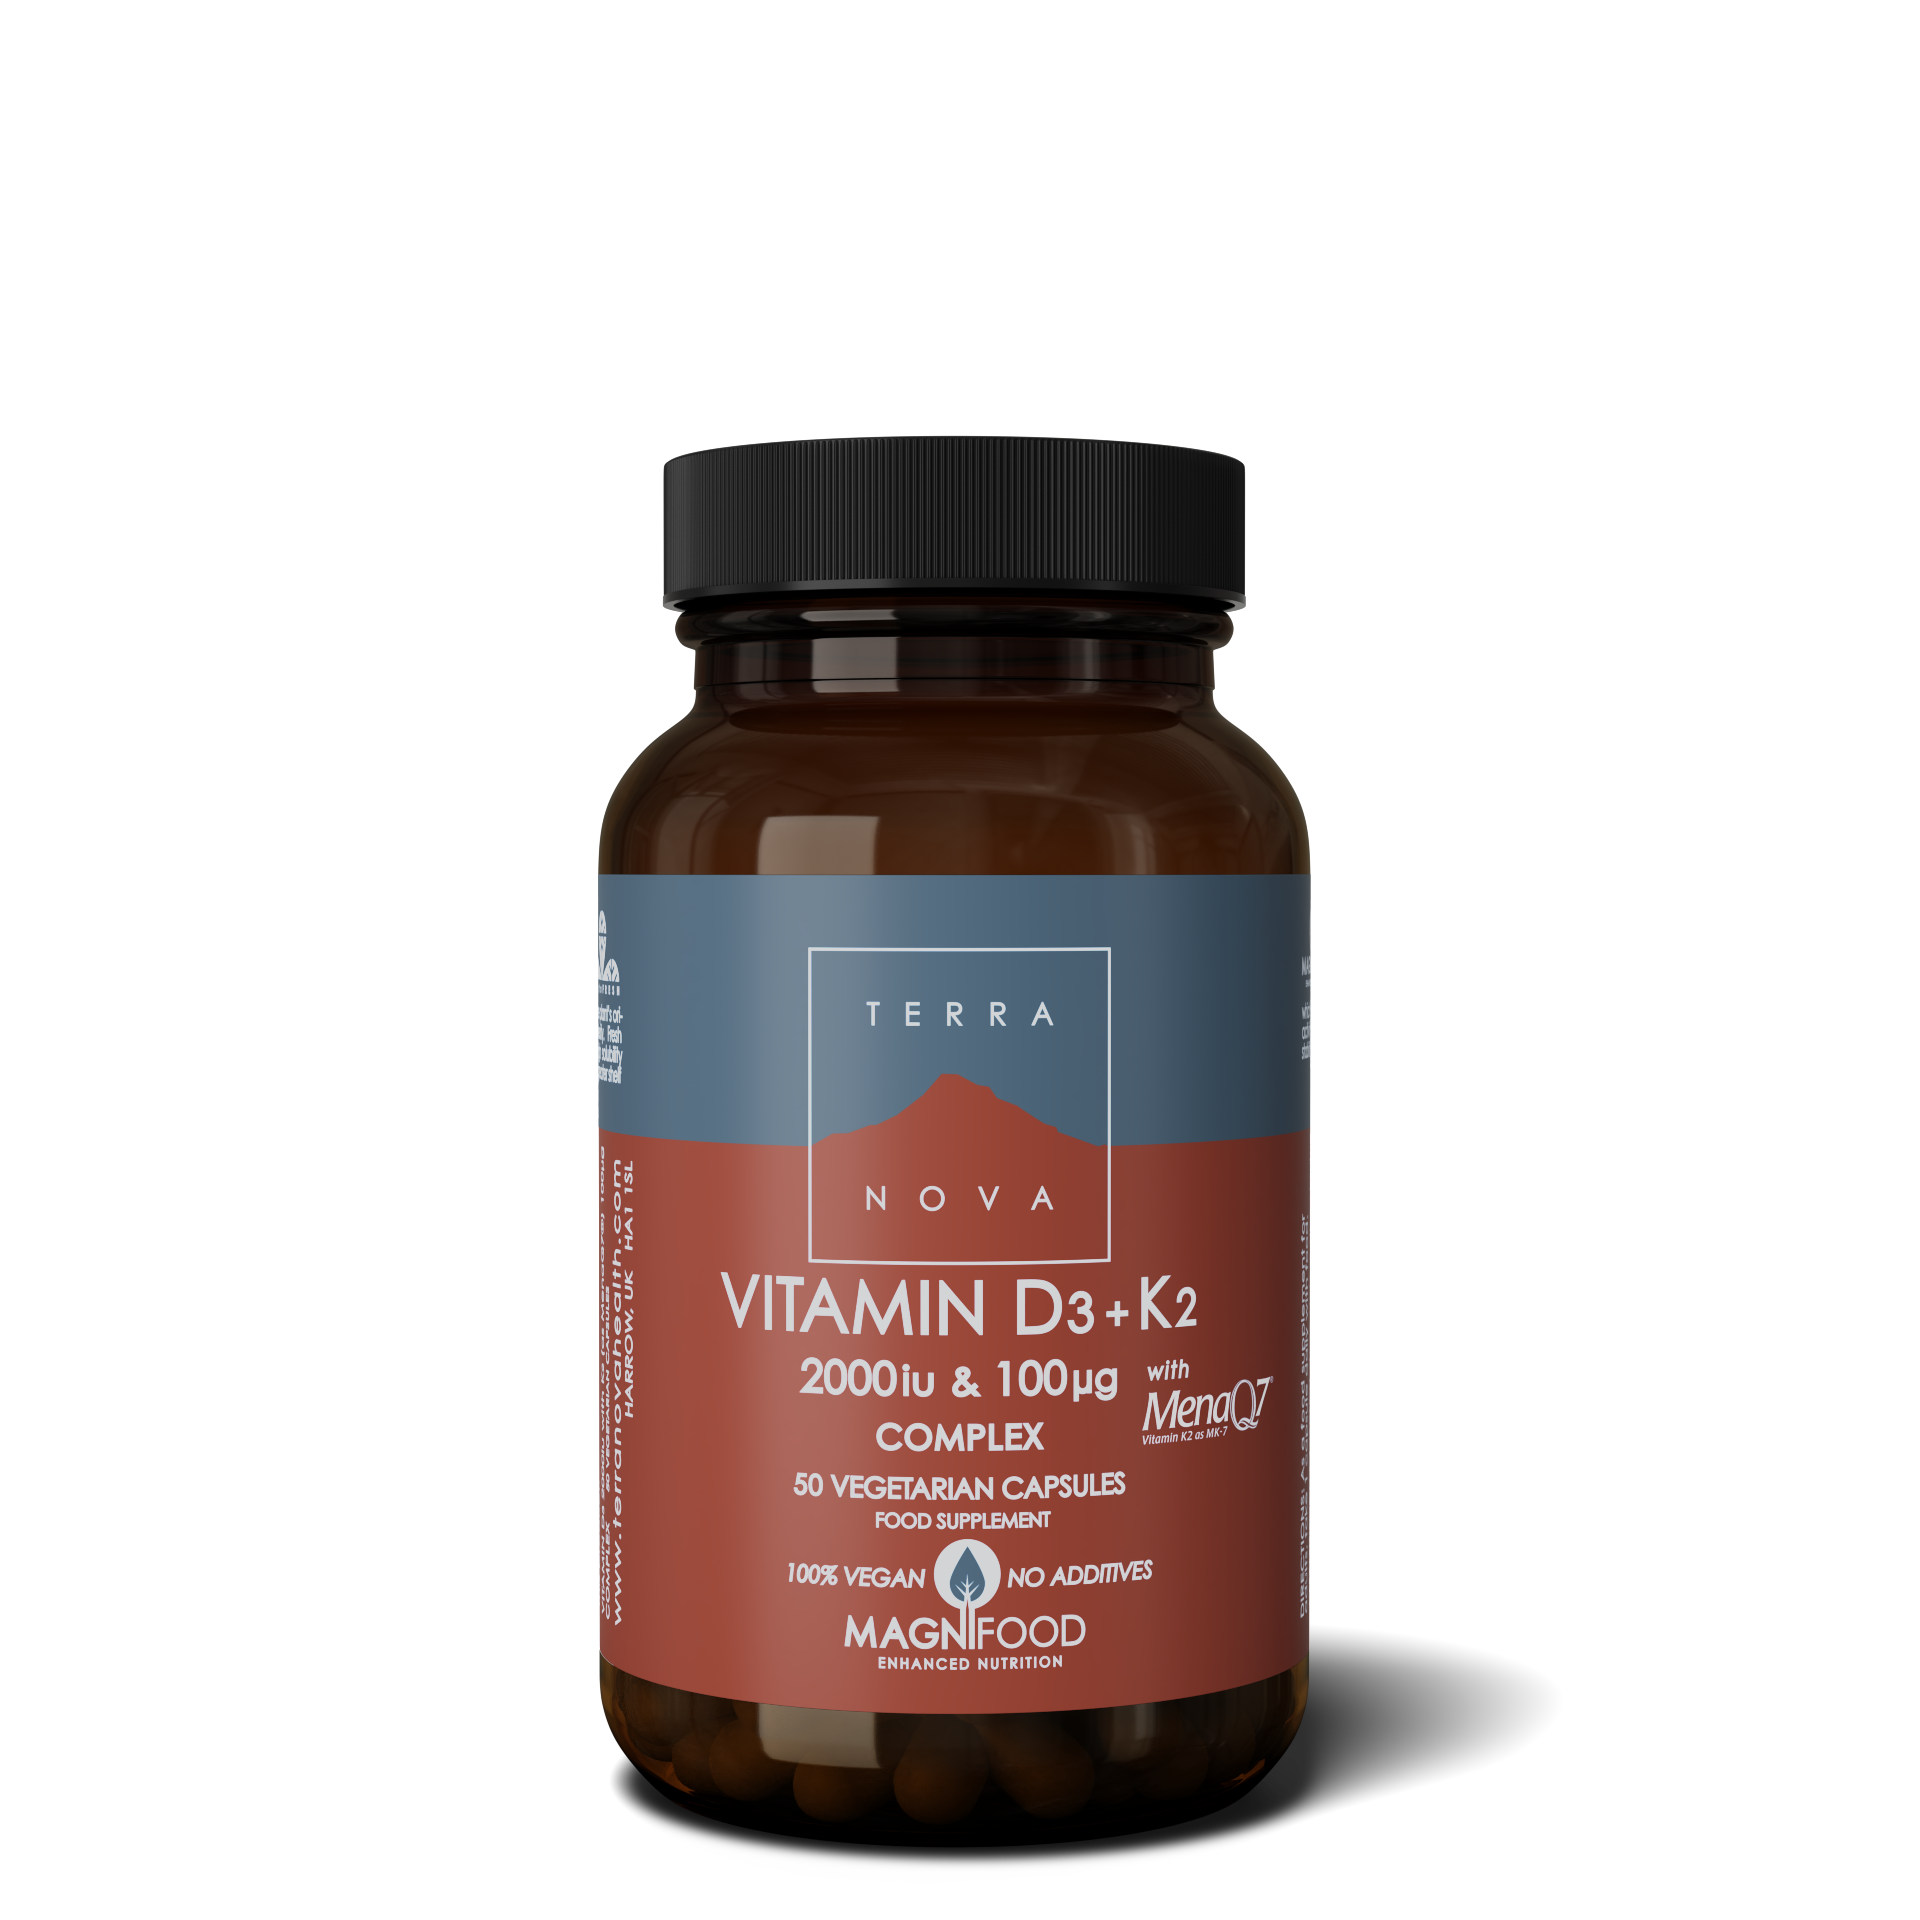 Vitamin D3 + Vitamin K2 2000iu & 100ug Complex 50's